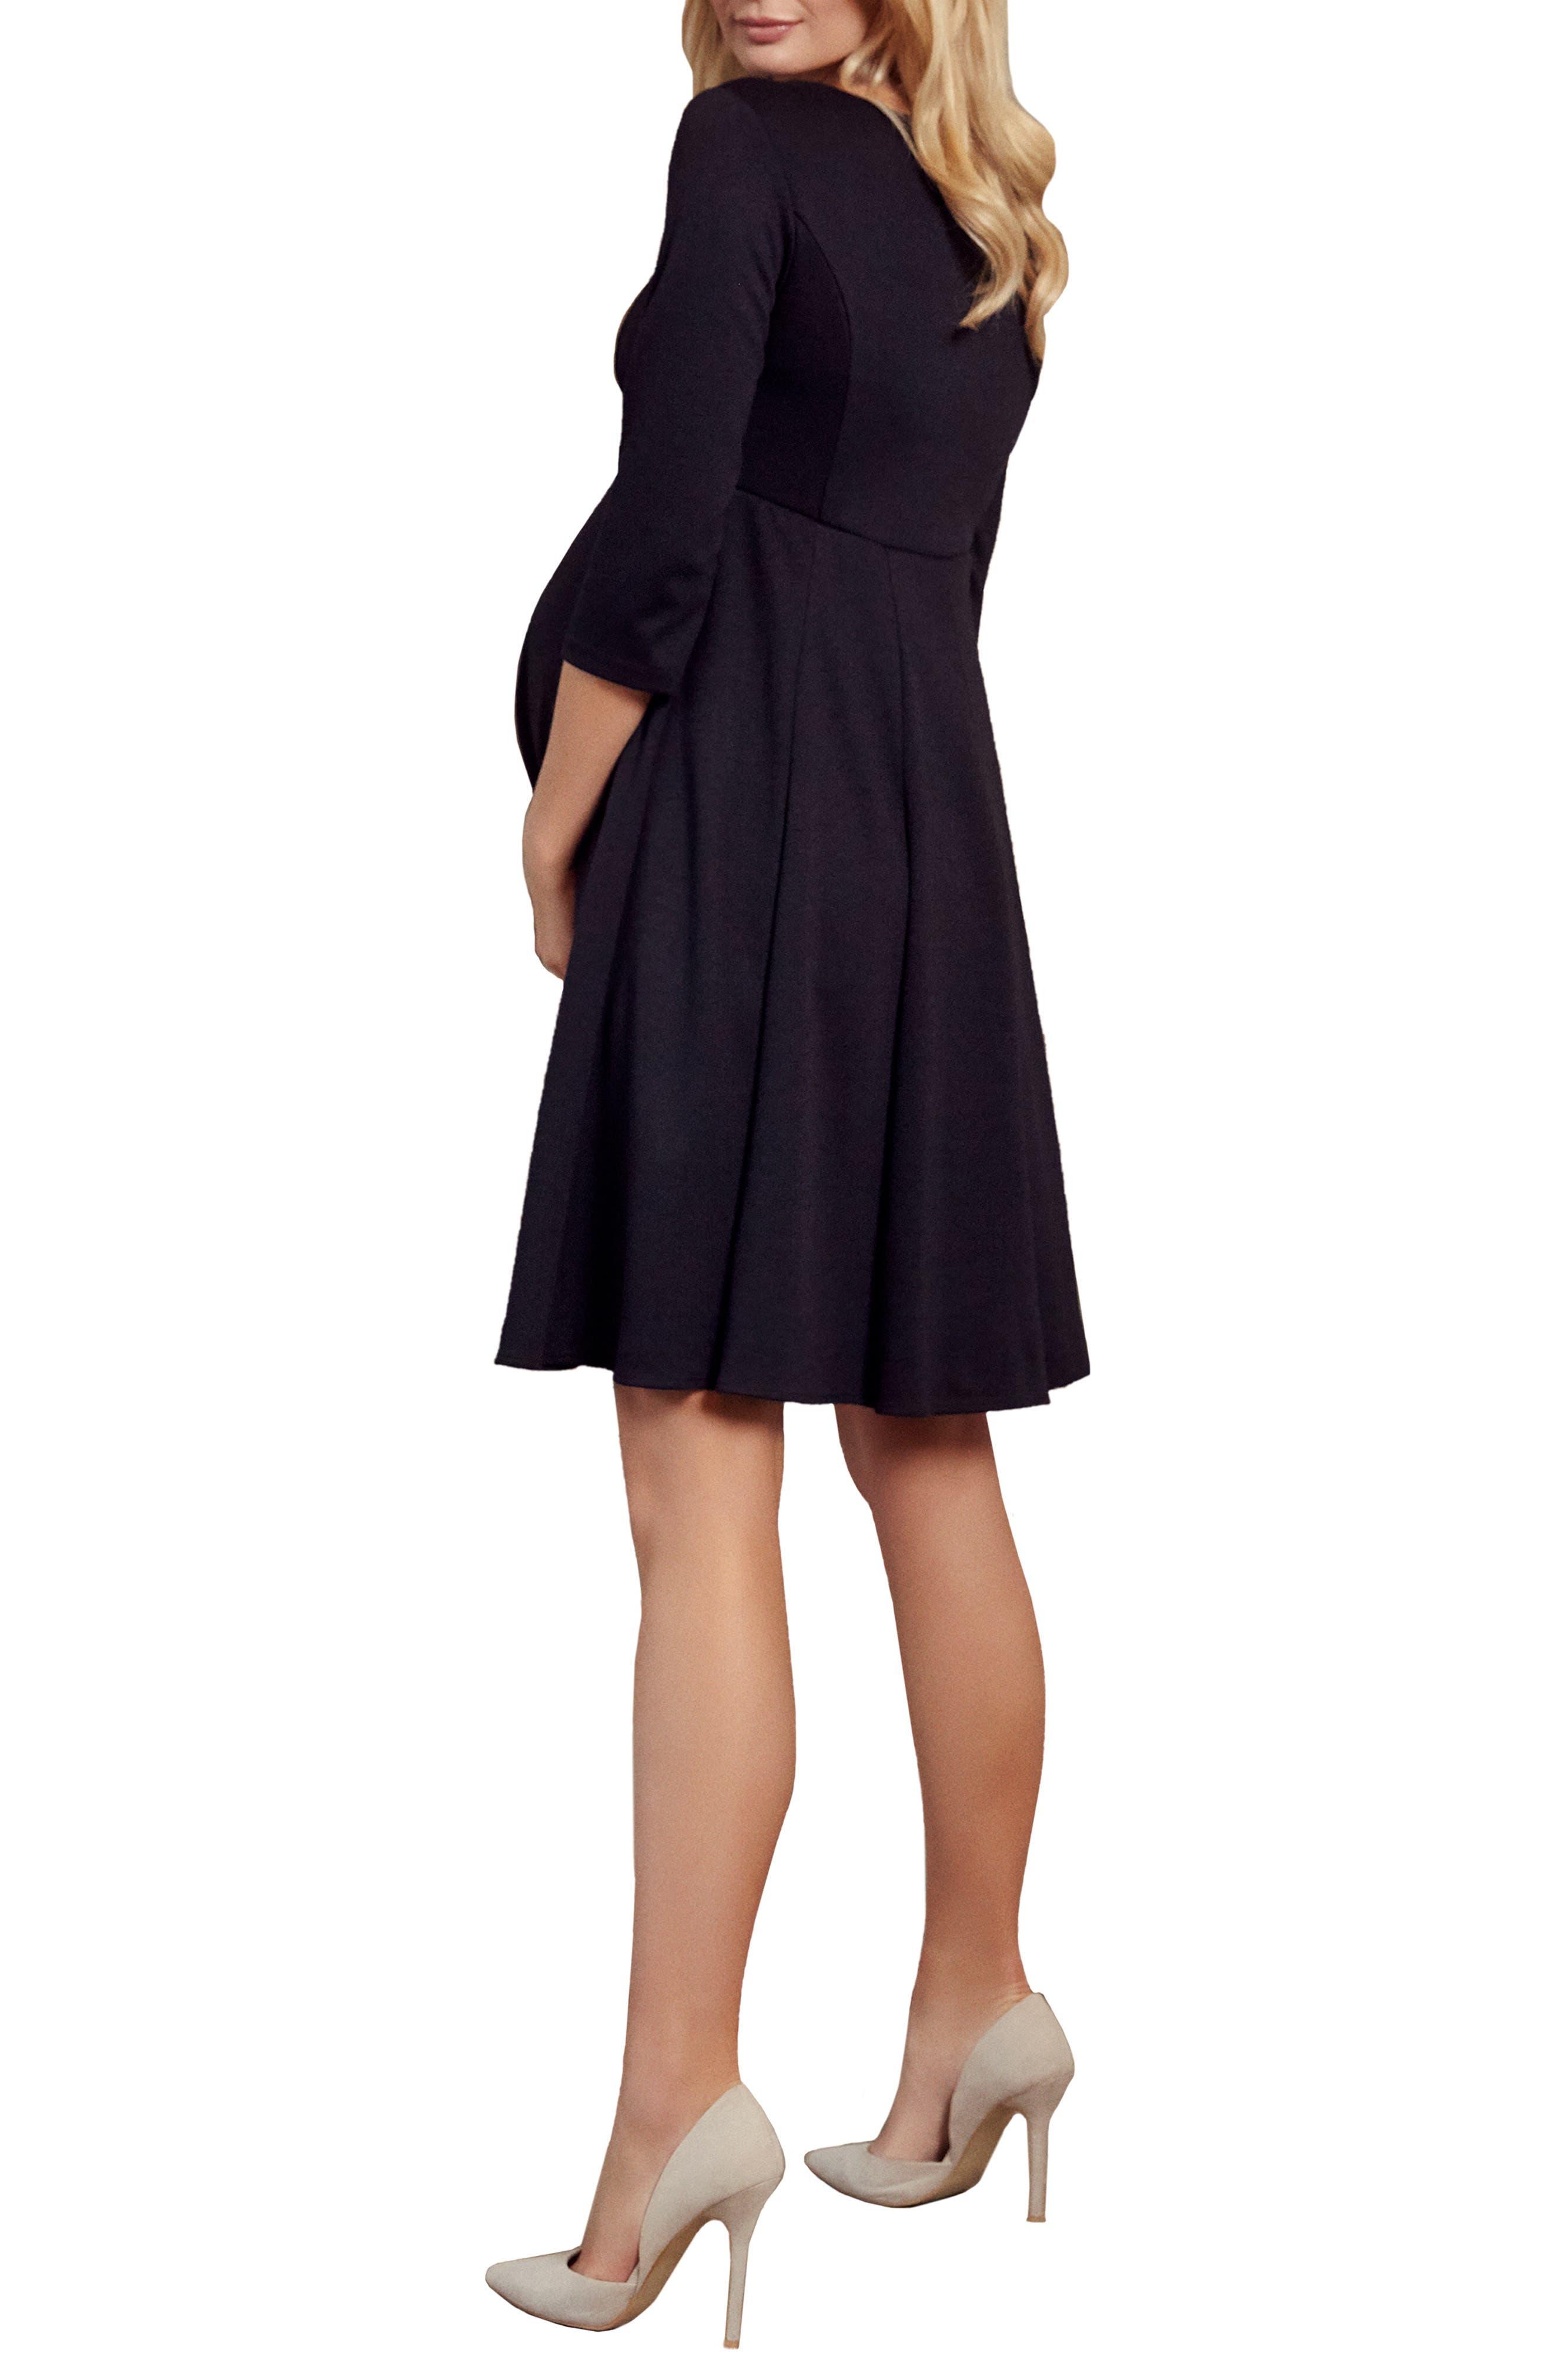 Sienna Maternity Dress,                             Alternate thumbnail 2, color,                             BLACK